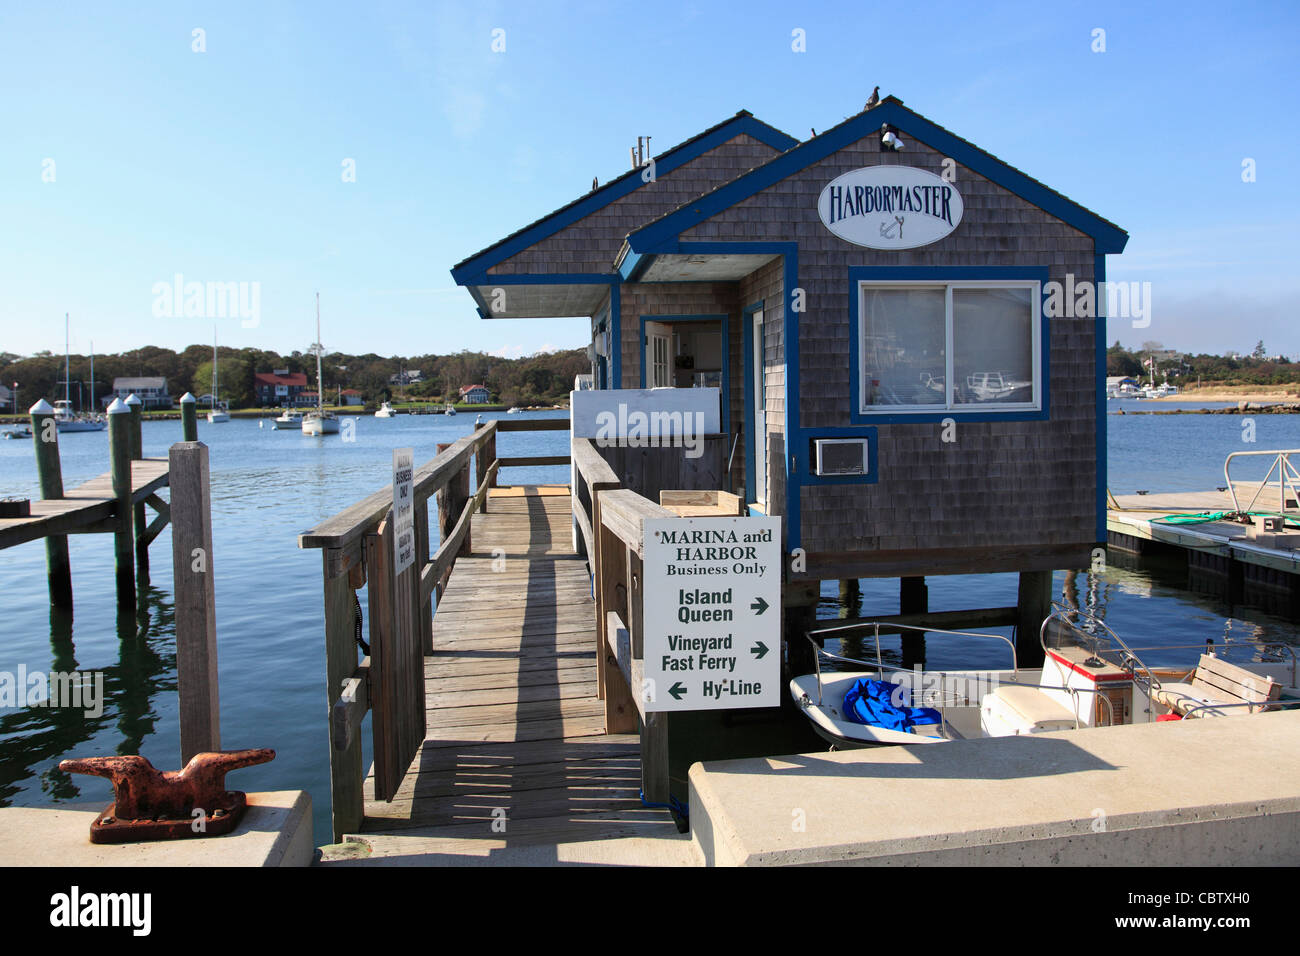 Harbormaster, Oak Bluffs, Marthas Vineyard, Massachusetts, New England, USA - Stock Image